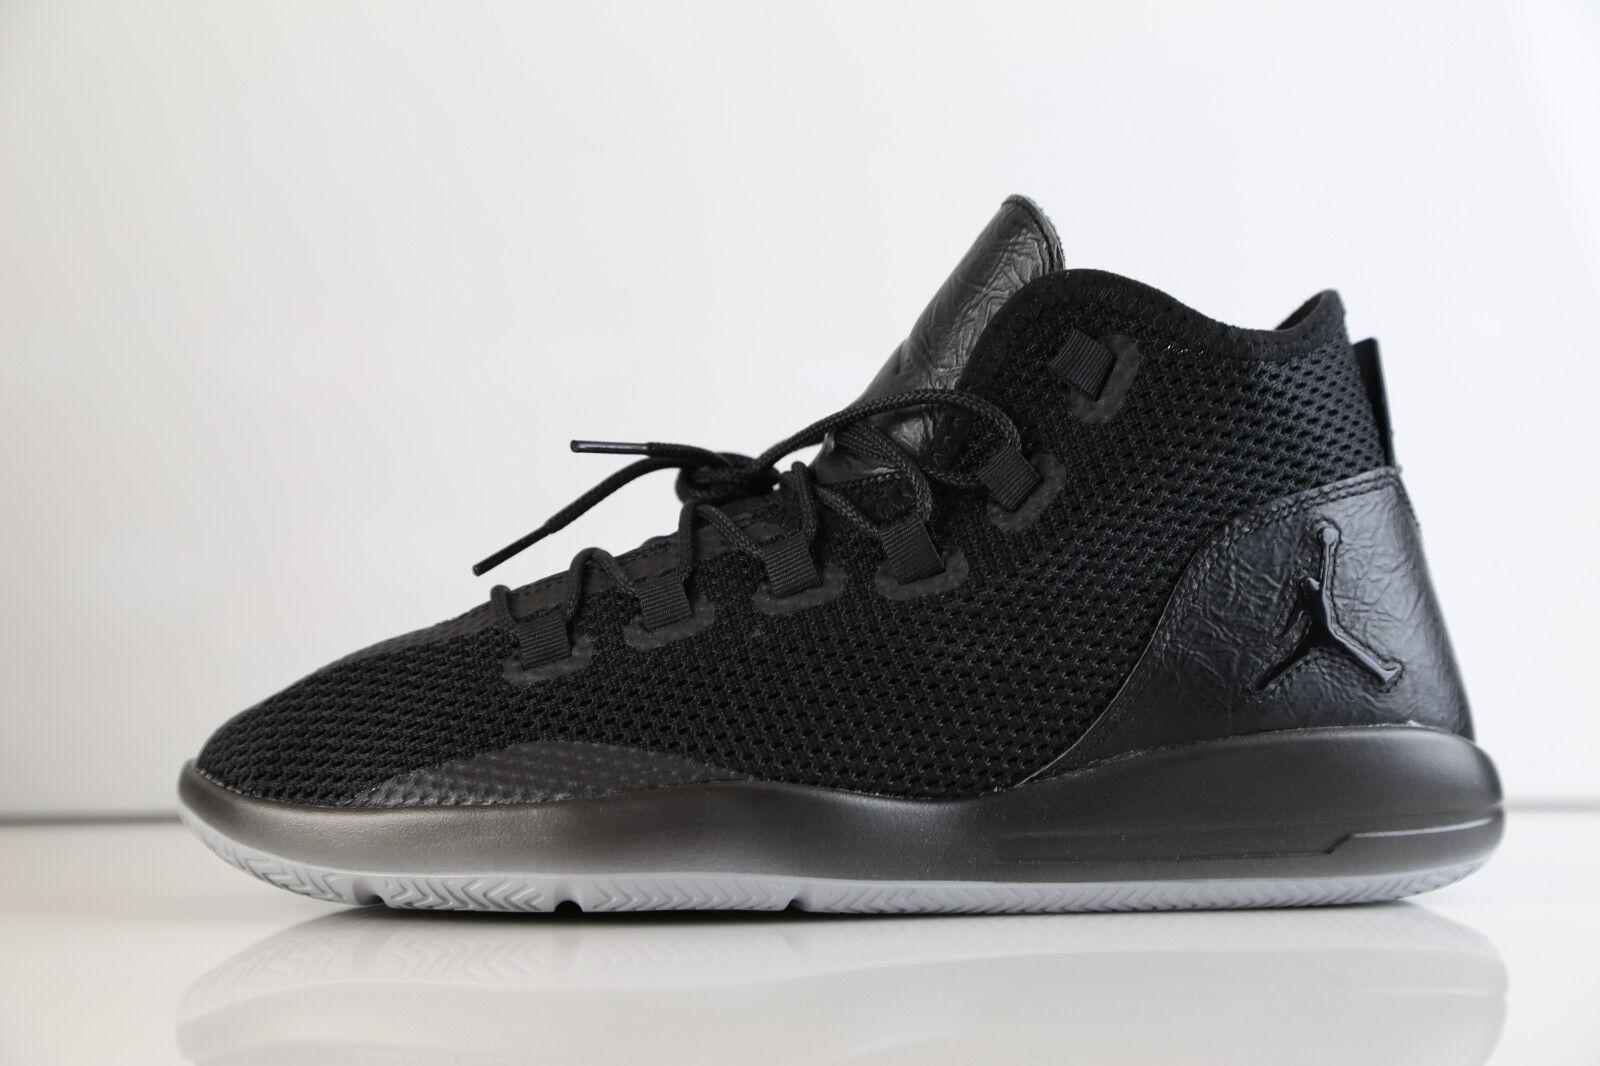 Nike Air Jordan Reveal Prem Black Grey 834229-010 8-14 eclipse 1 11 3